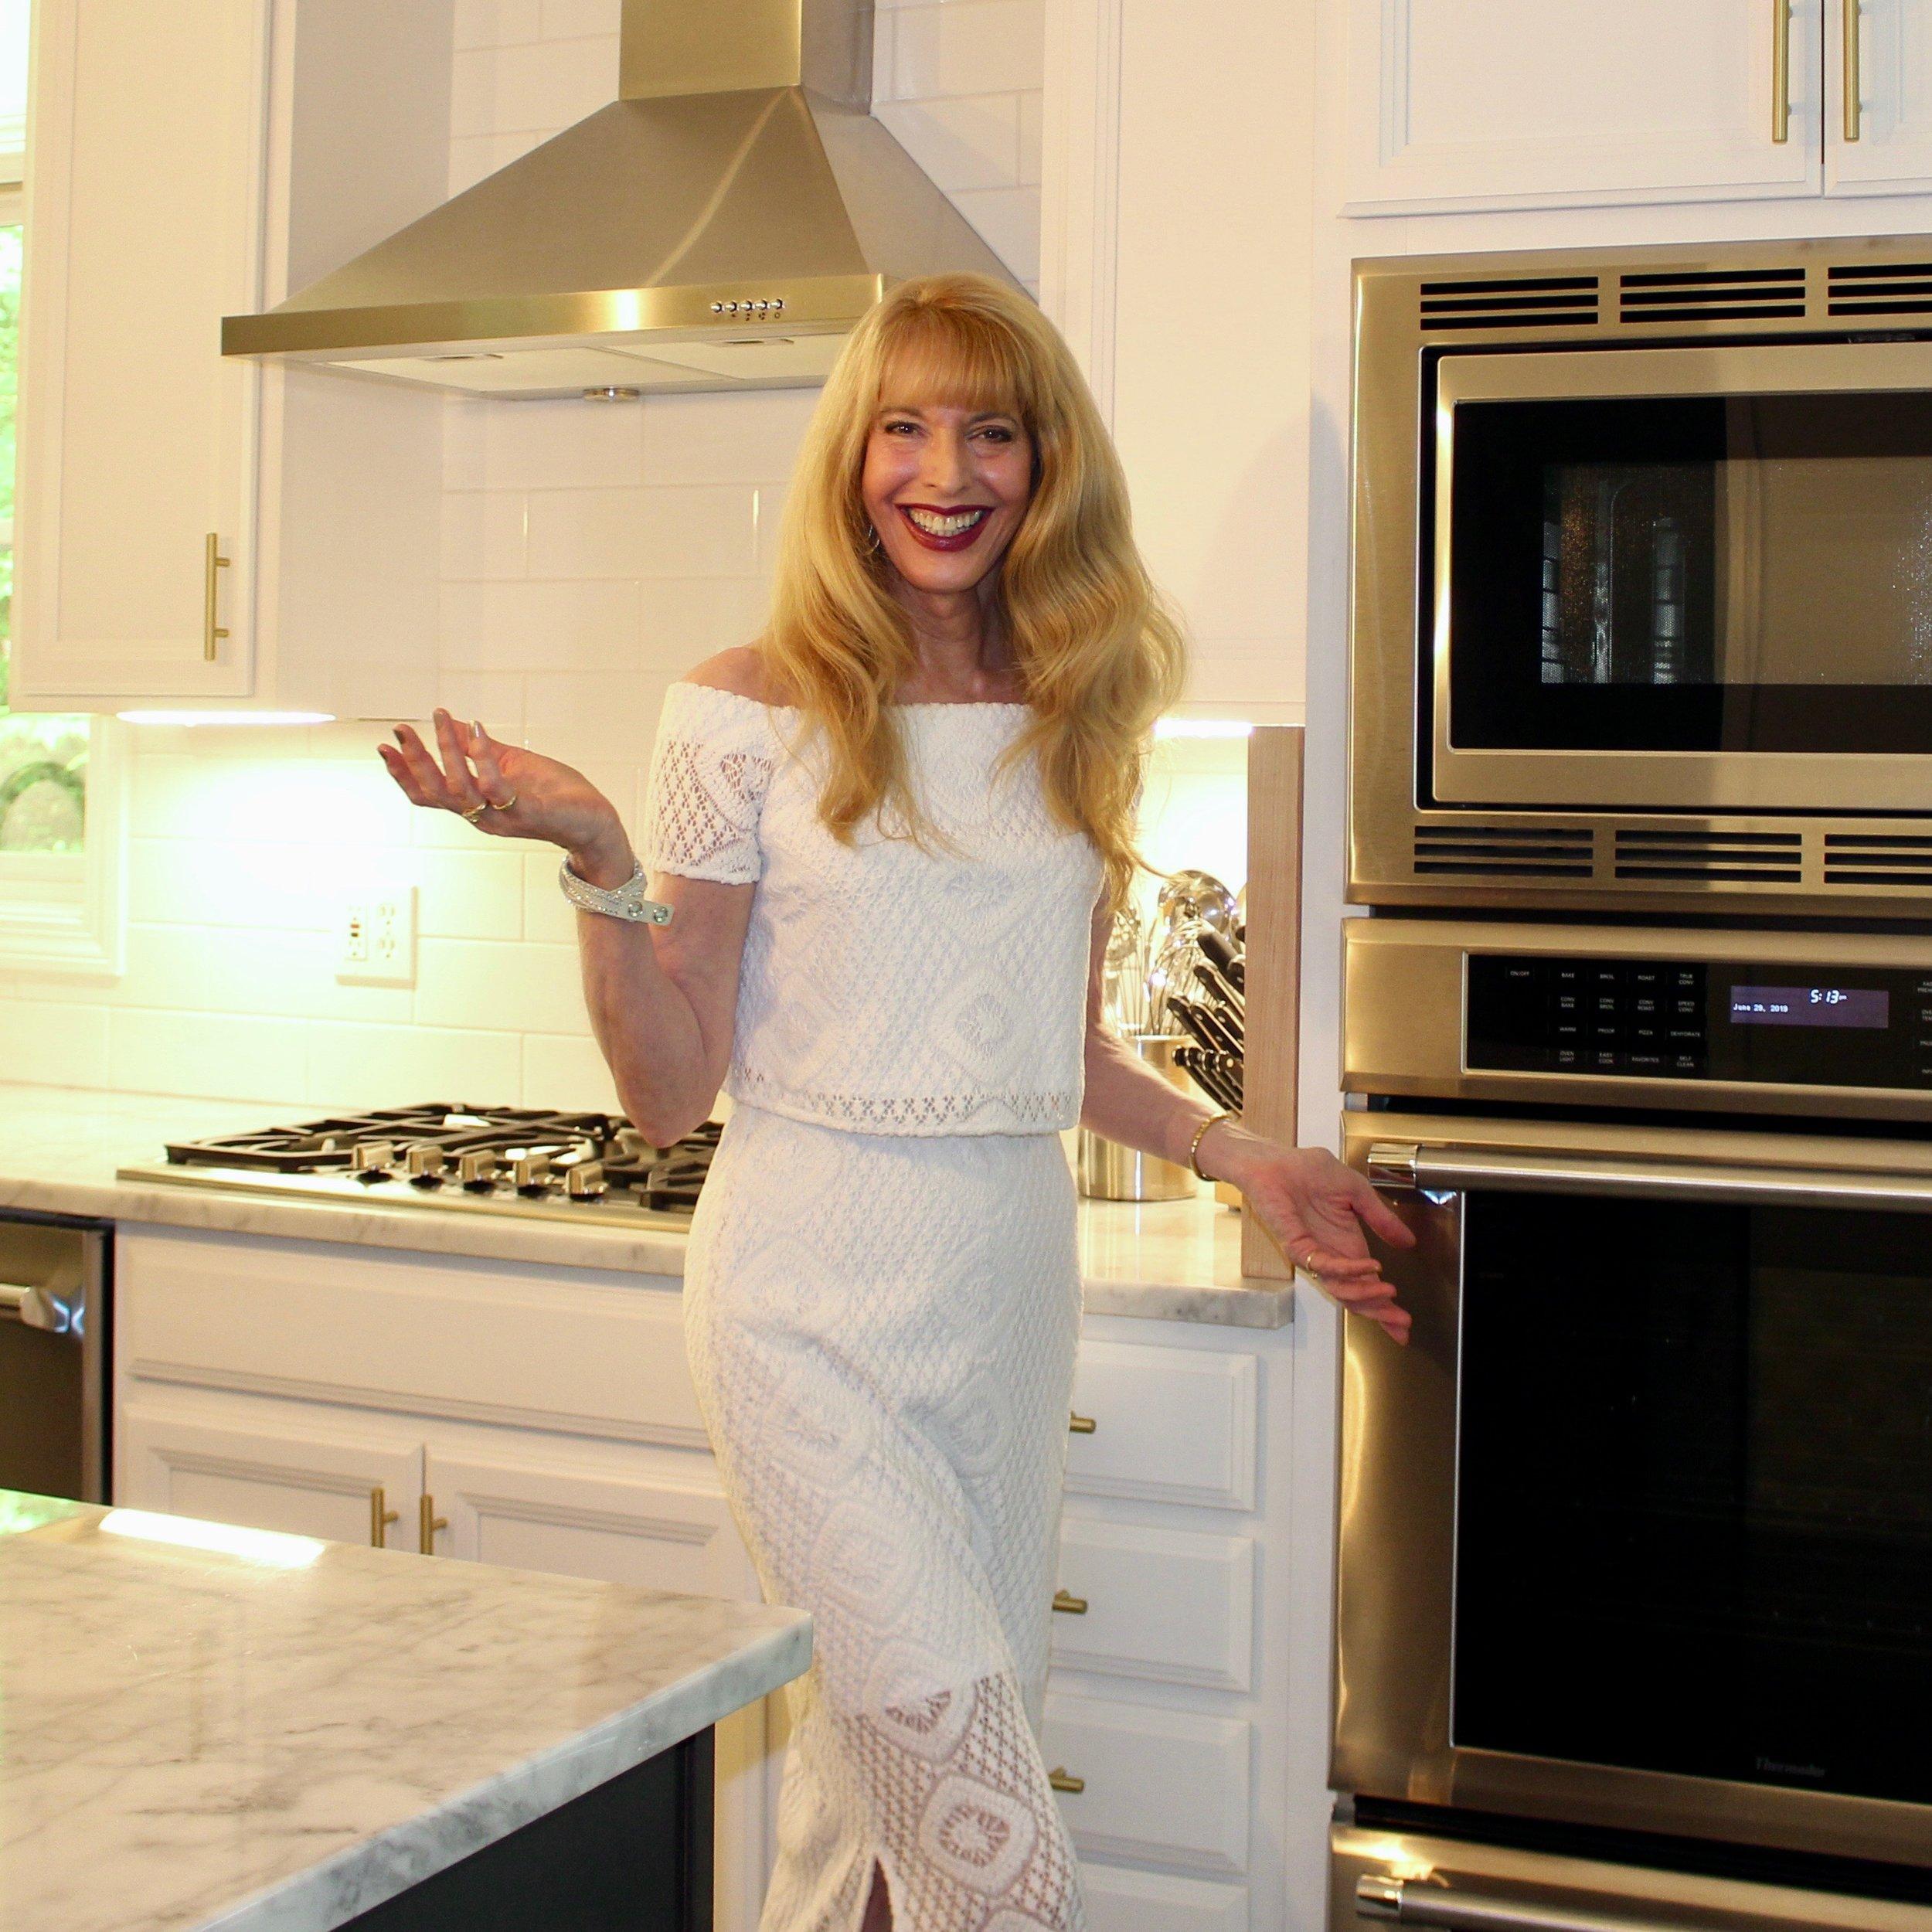 Kathy-kitchen.jpeg